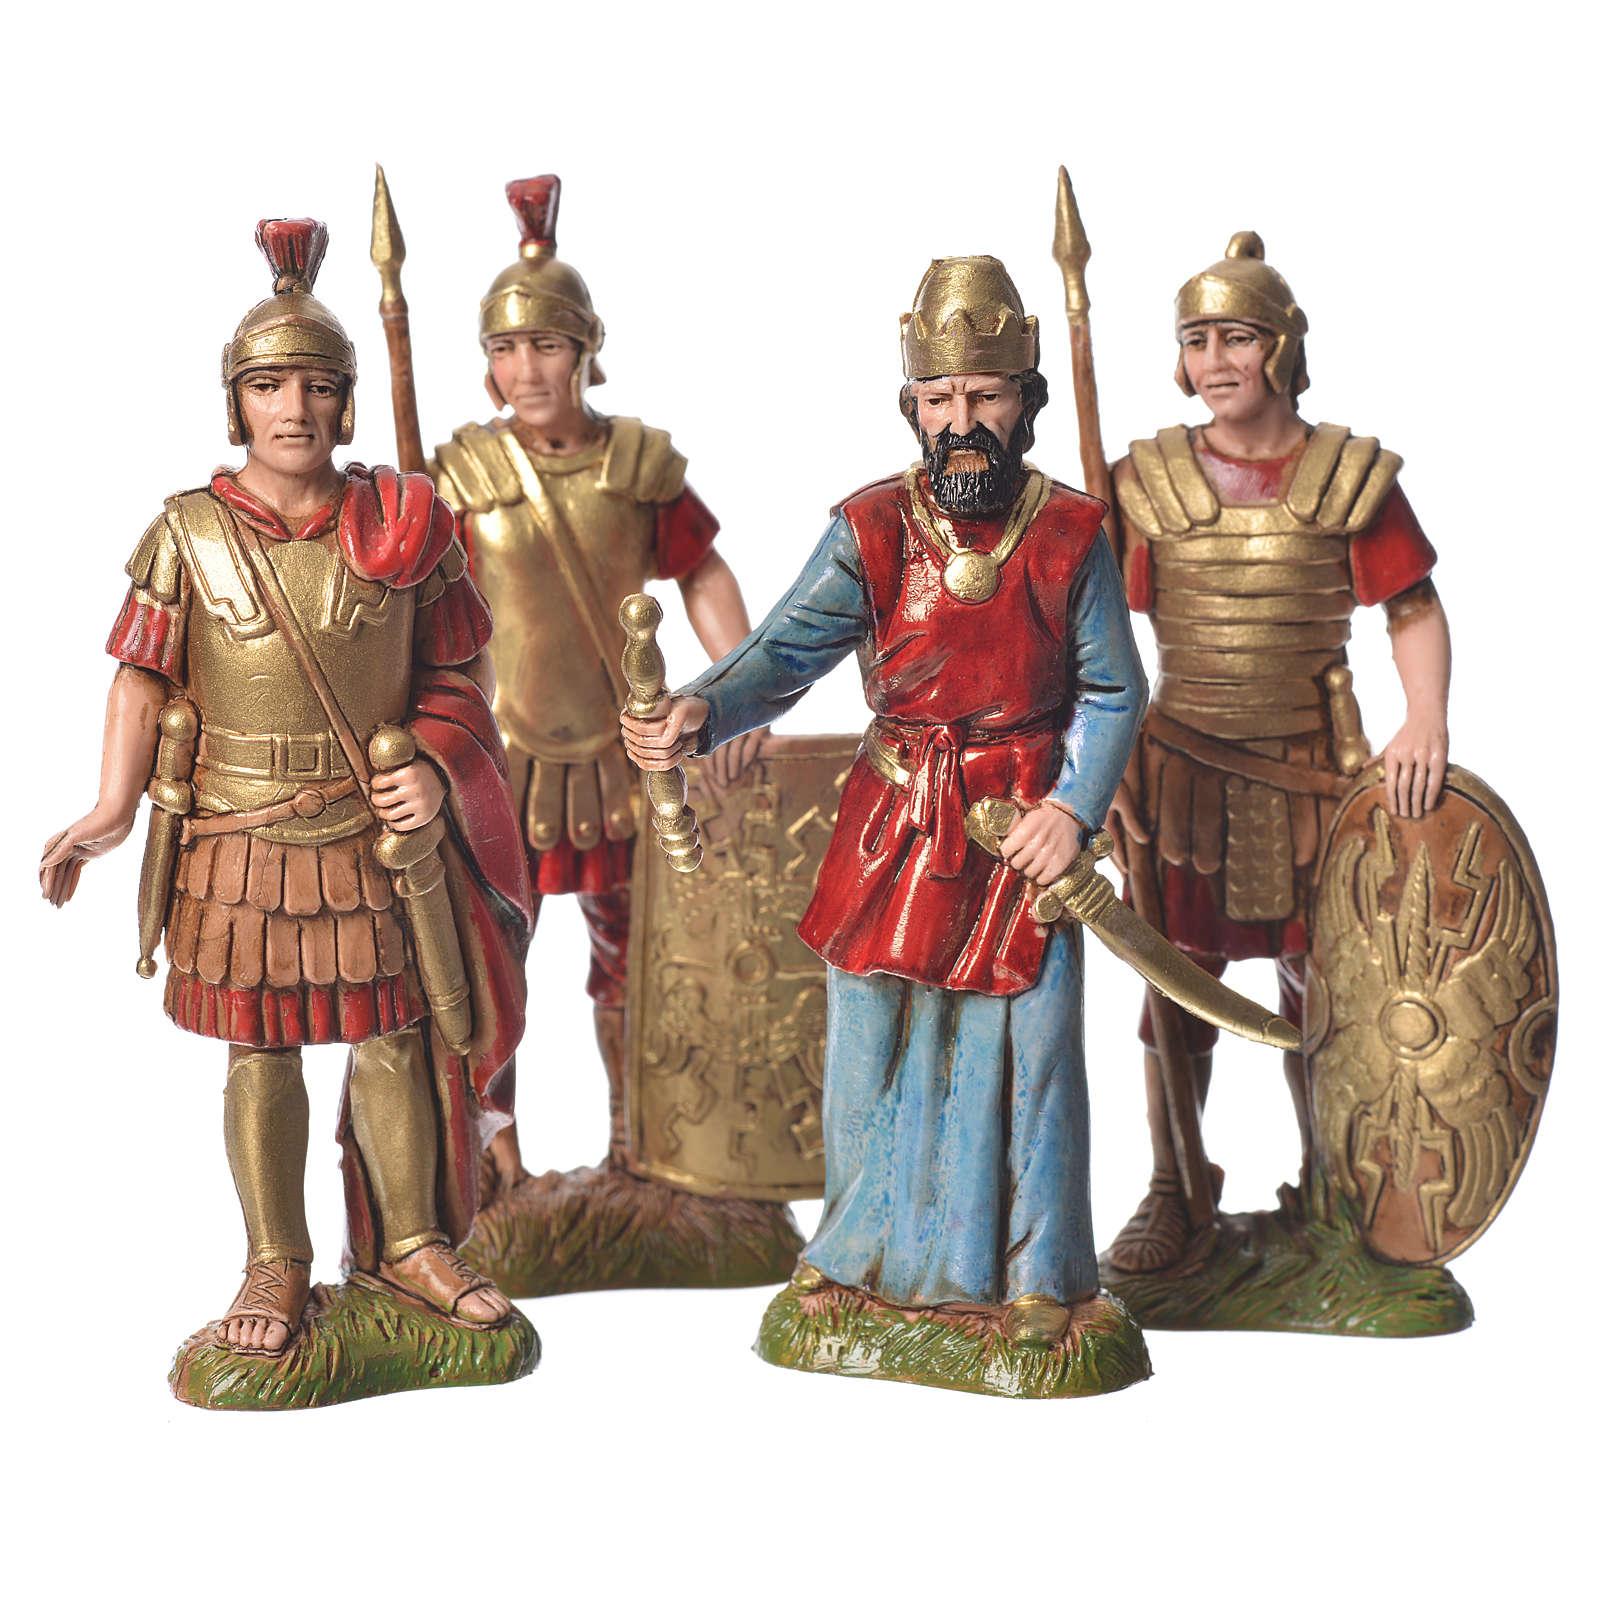 King Herod with soldiers, 4 nativity figurines, 10cm Moranduzzo 4